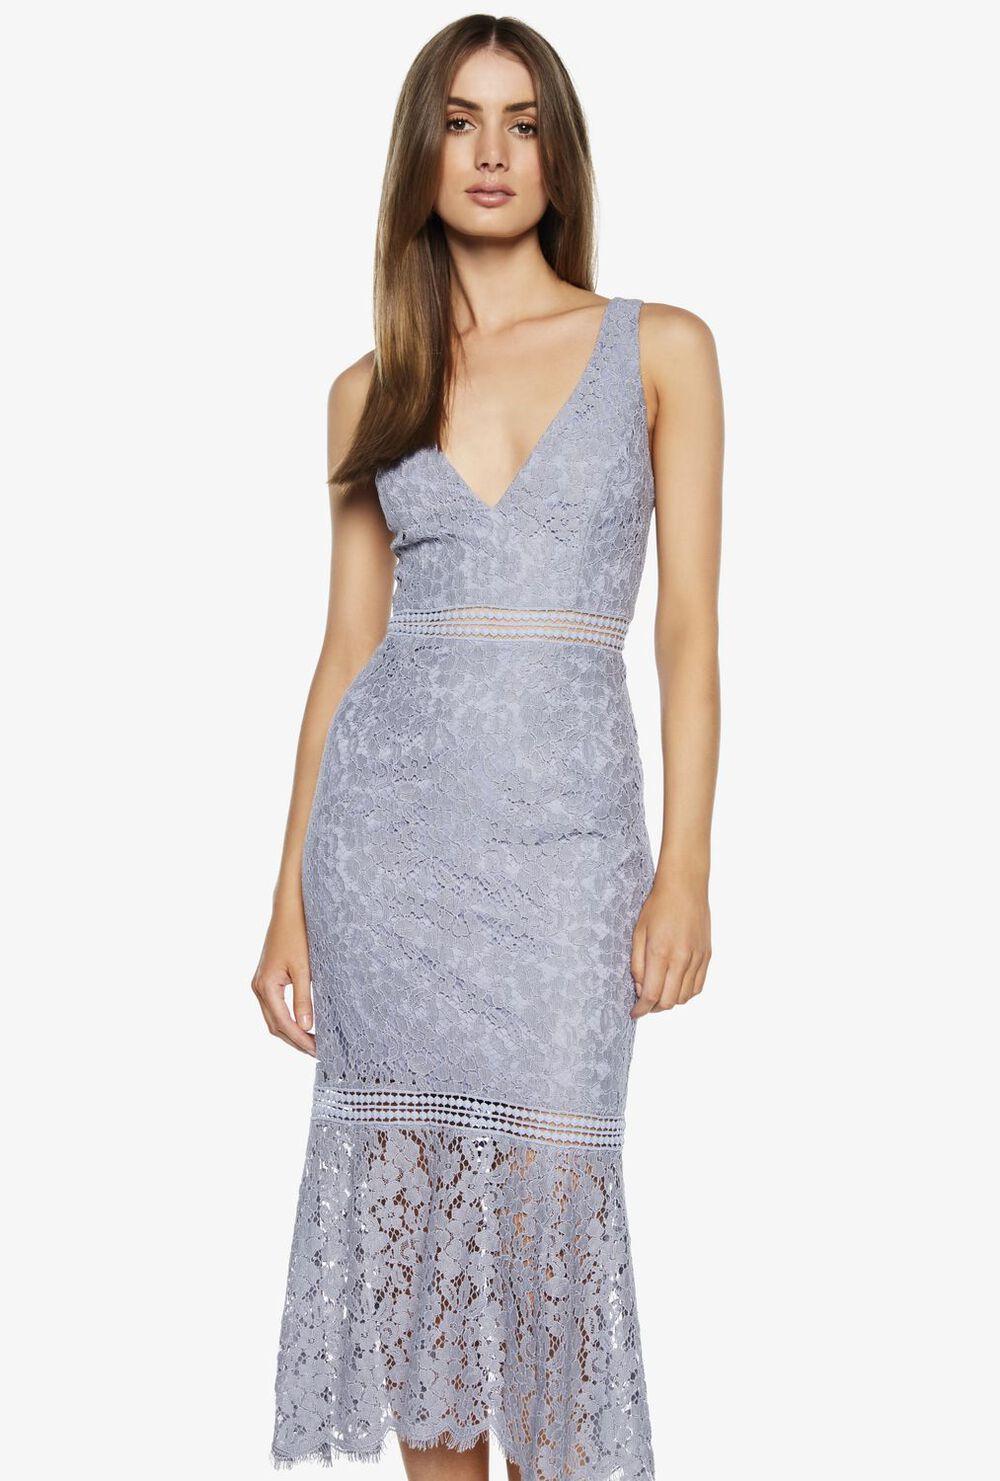 SIENNA TRUMPET DRESS. in colour MAJOLICA BLUE